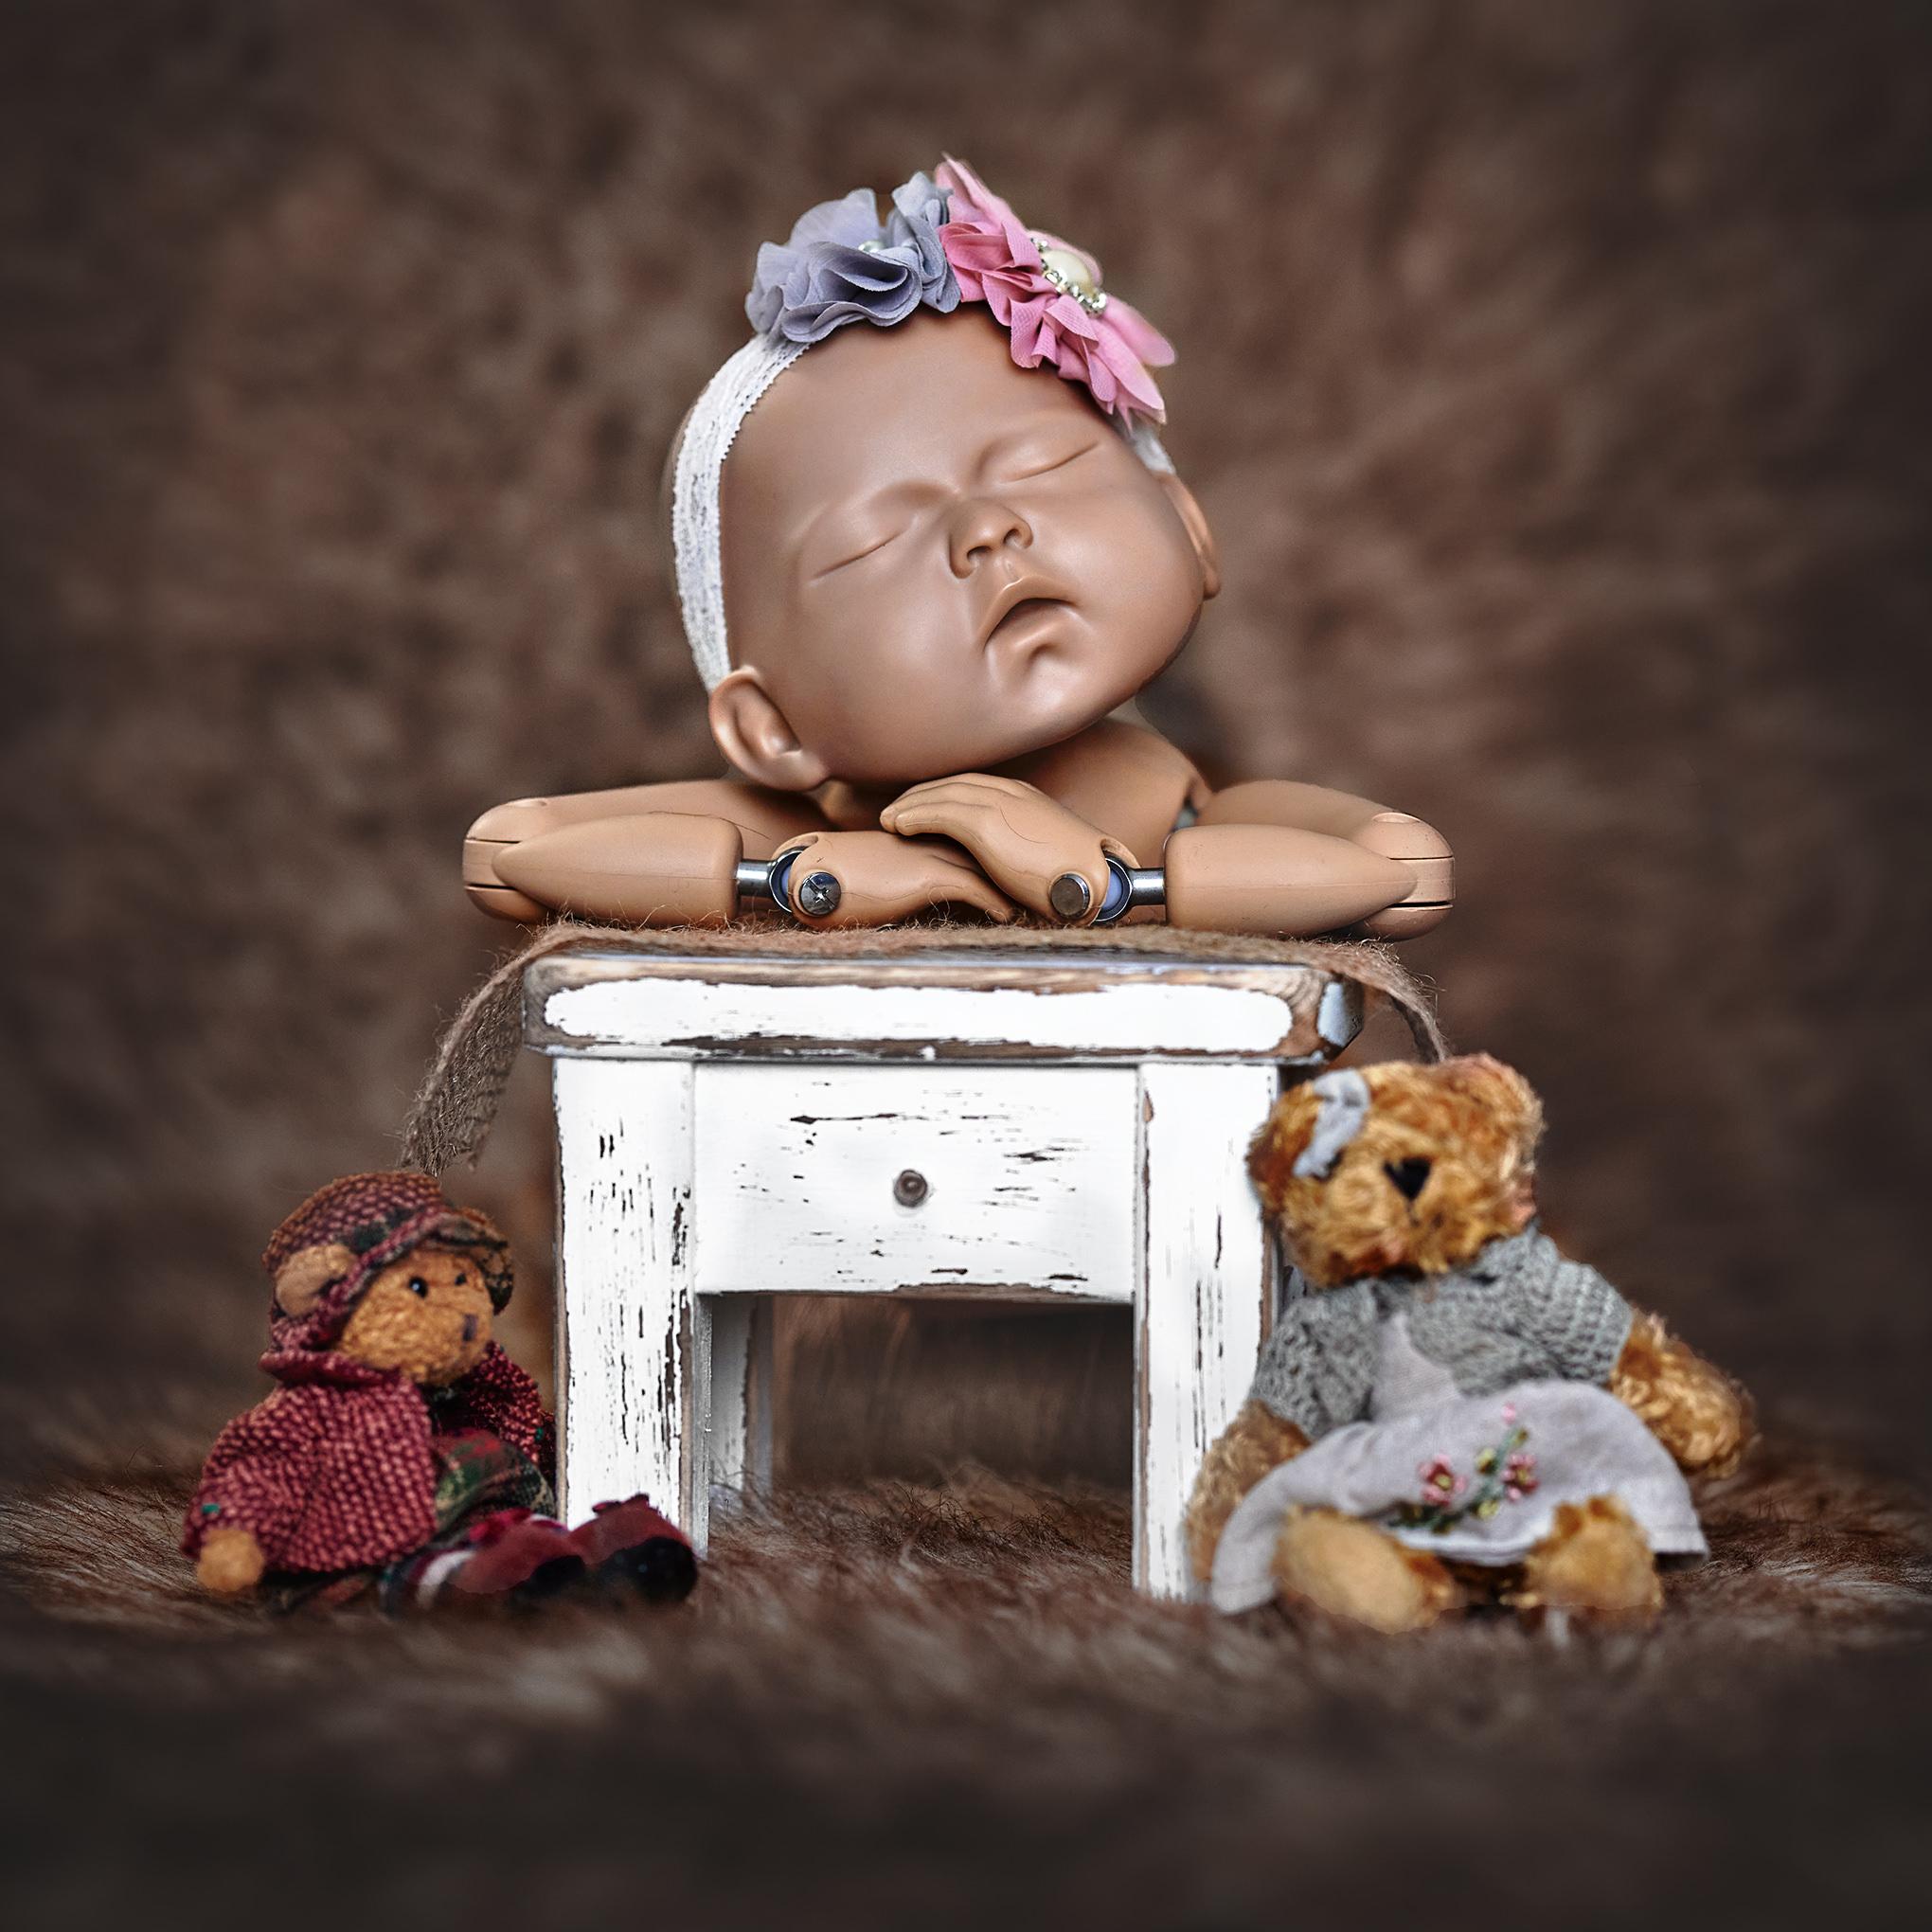 sesja Newborn noworodkowa zdjęcia FotoRobert Pila